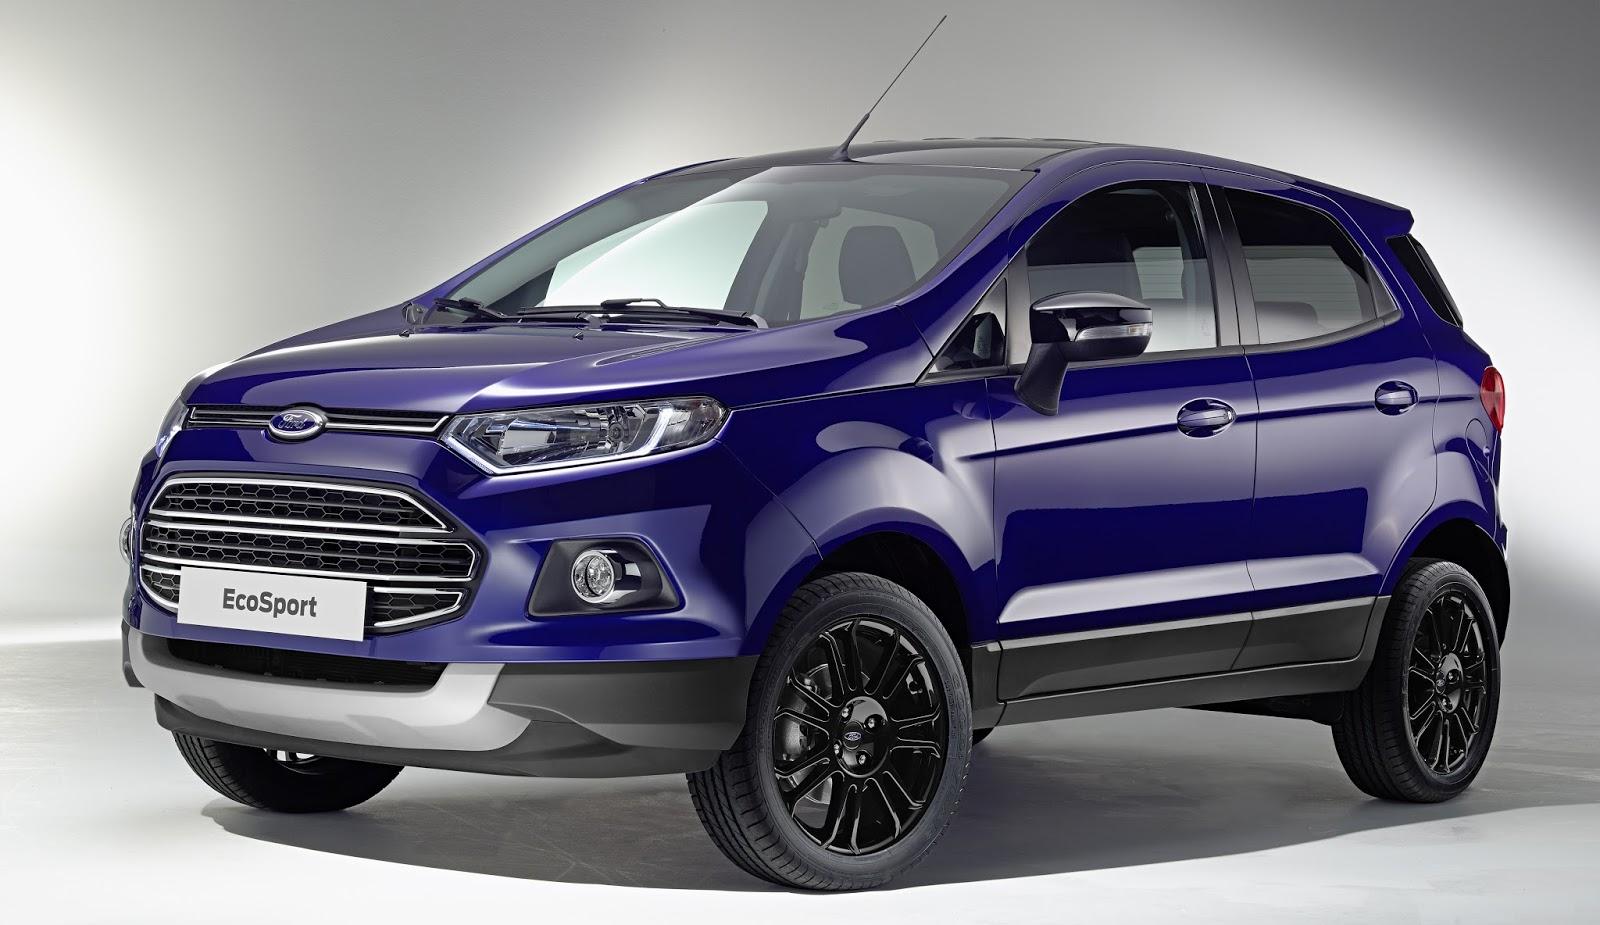 Onlinecasinosfun dealer ford jakarta dan harga ford ecosport